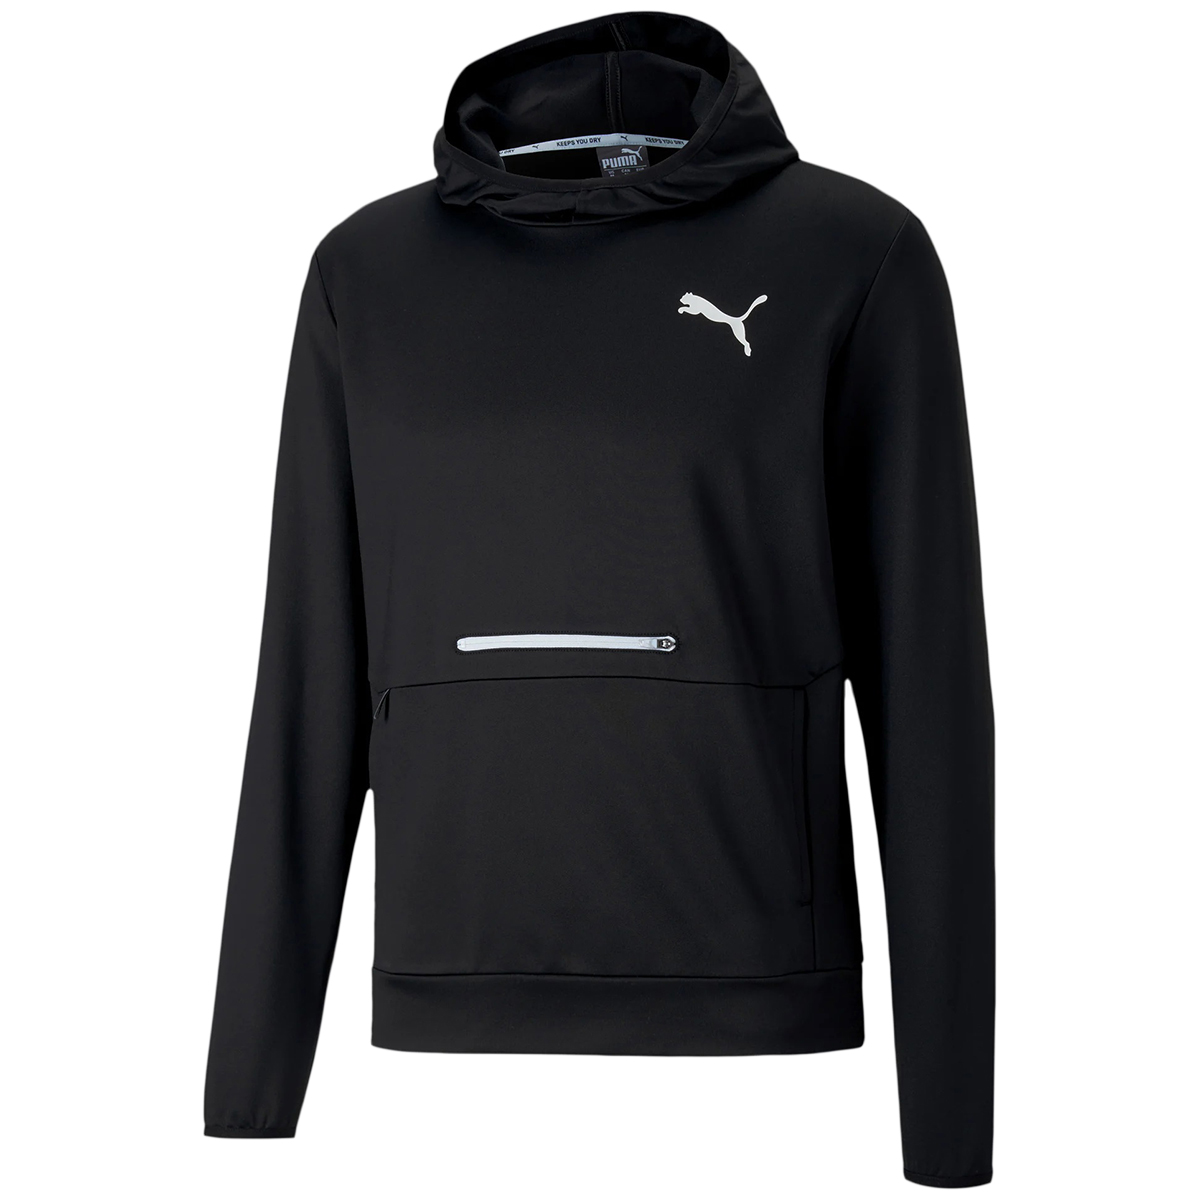 Puma Men's Long-Sleeve Training Hoodie - Black, L